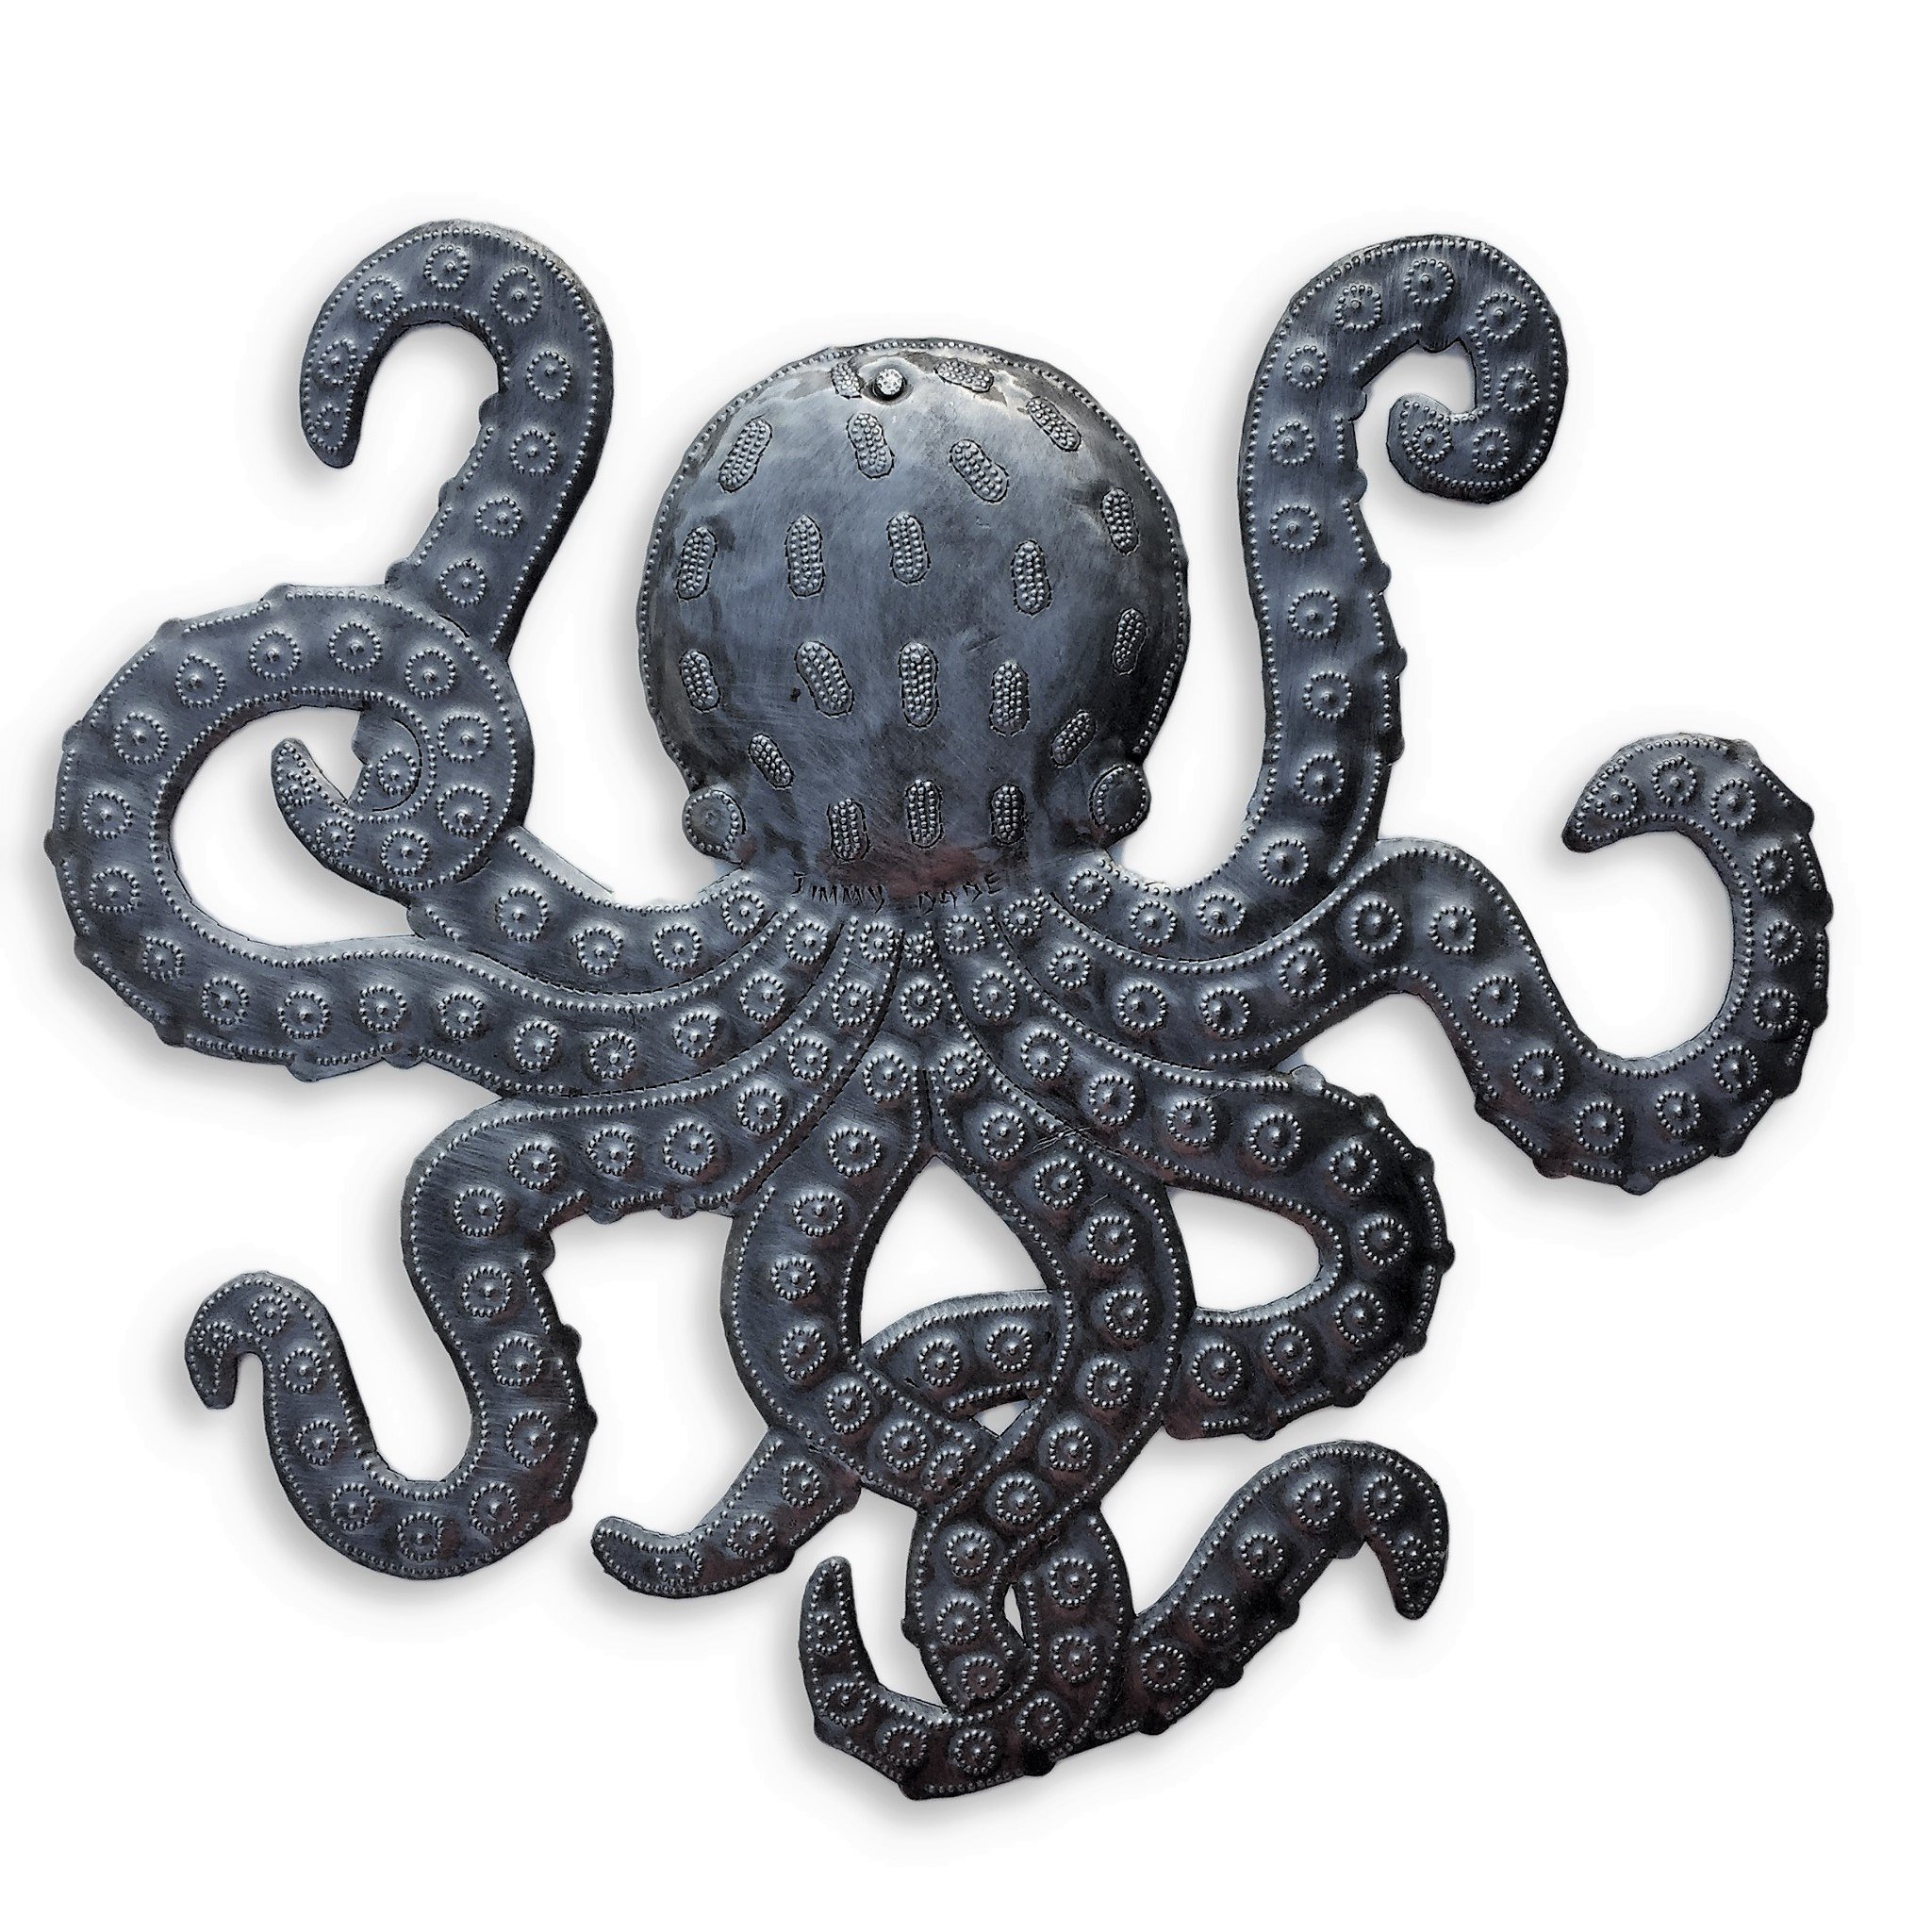 Octopus Metal wall Art, Sea Life Ocean Decor, Ocean Themed Artwork 14''x 15''